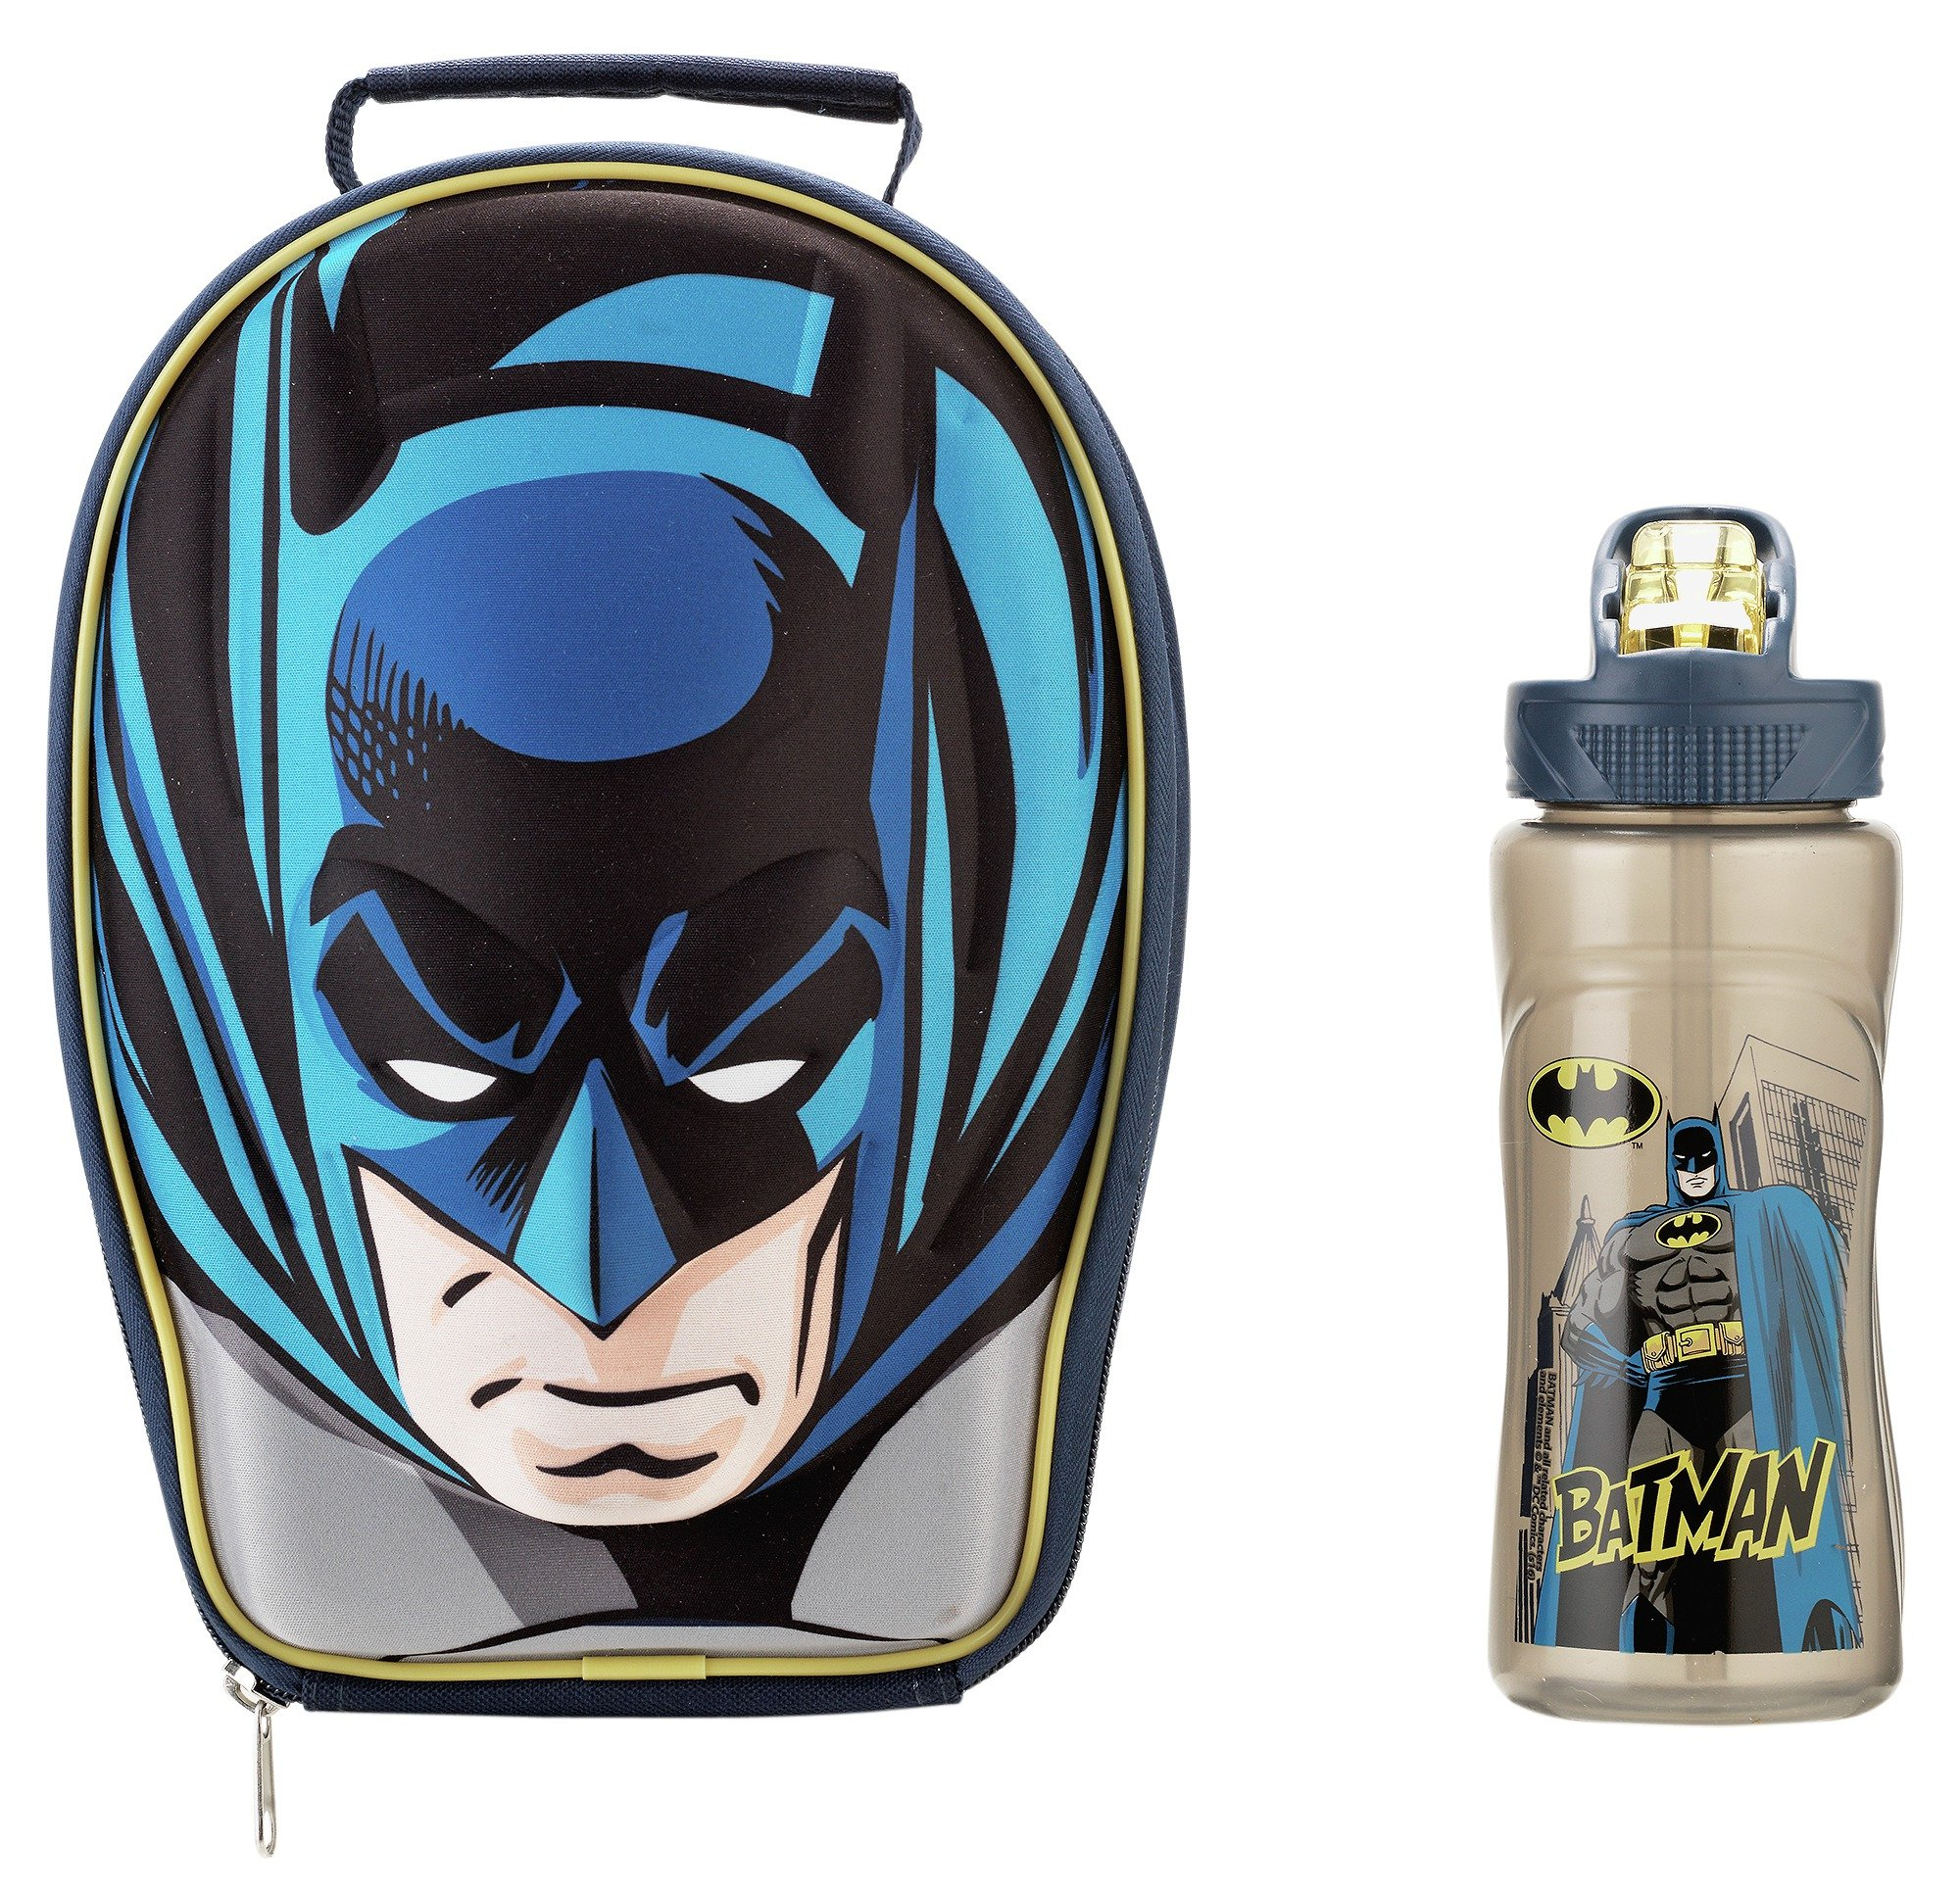 Image of Batman Lunch Bag and Bottle